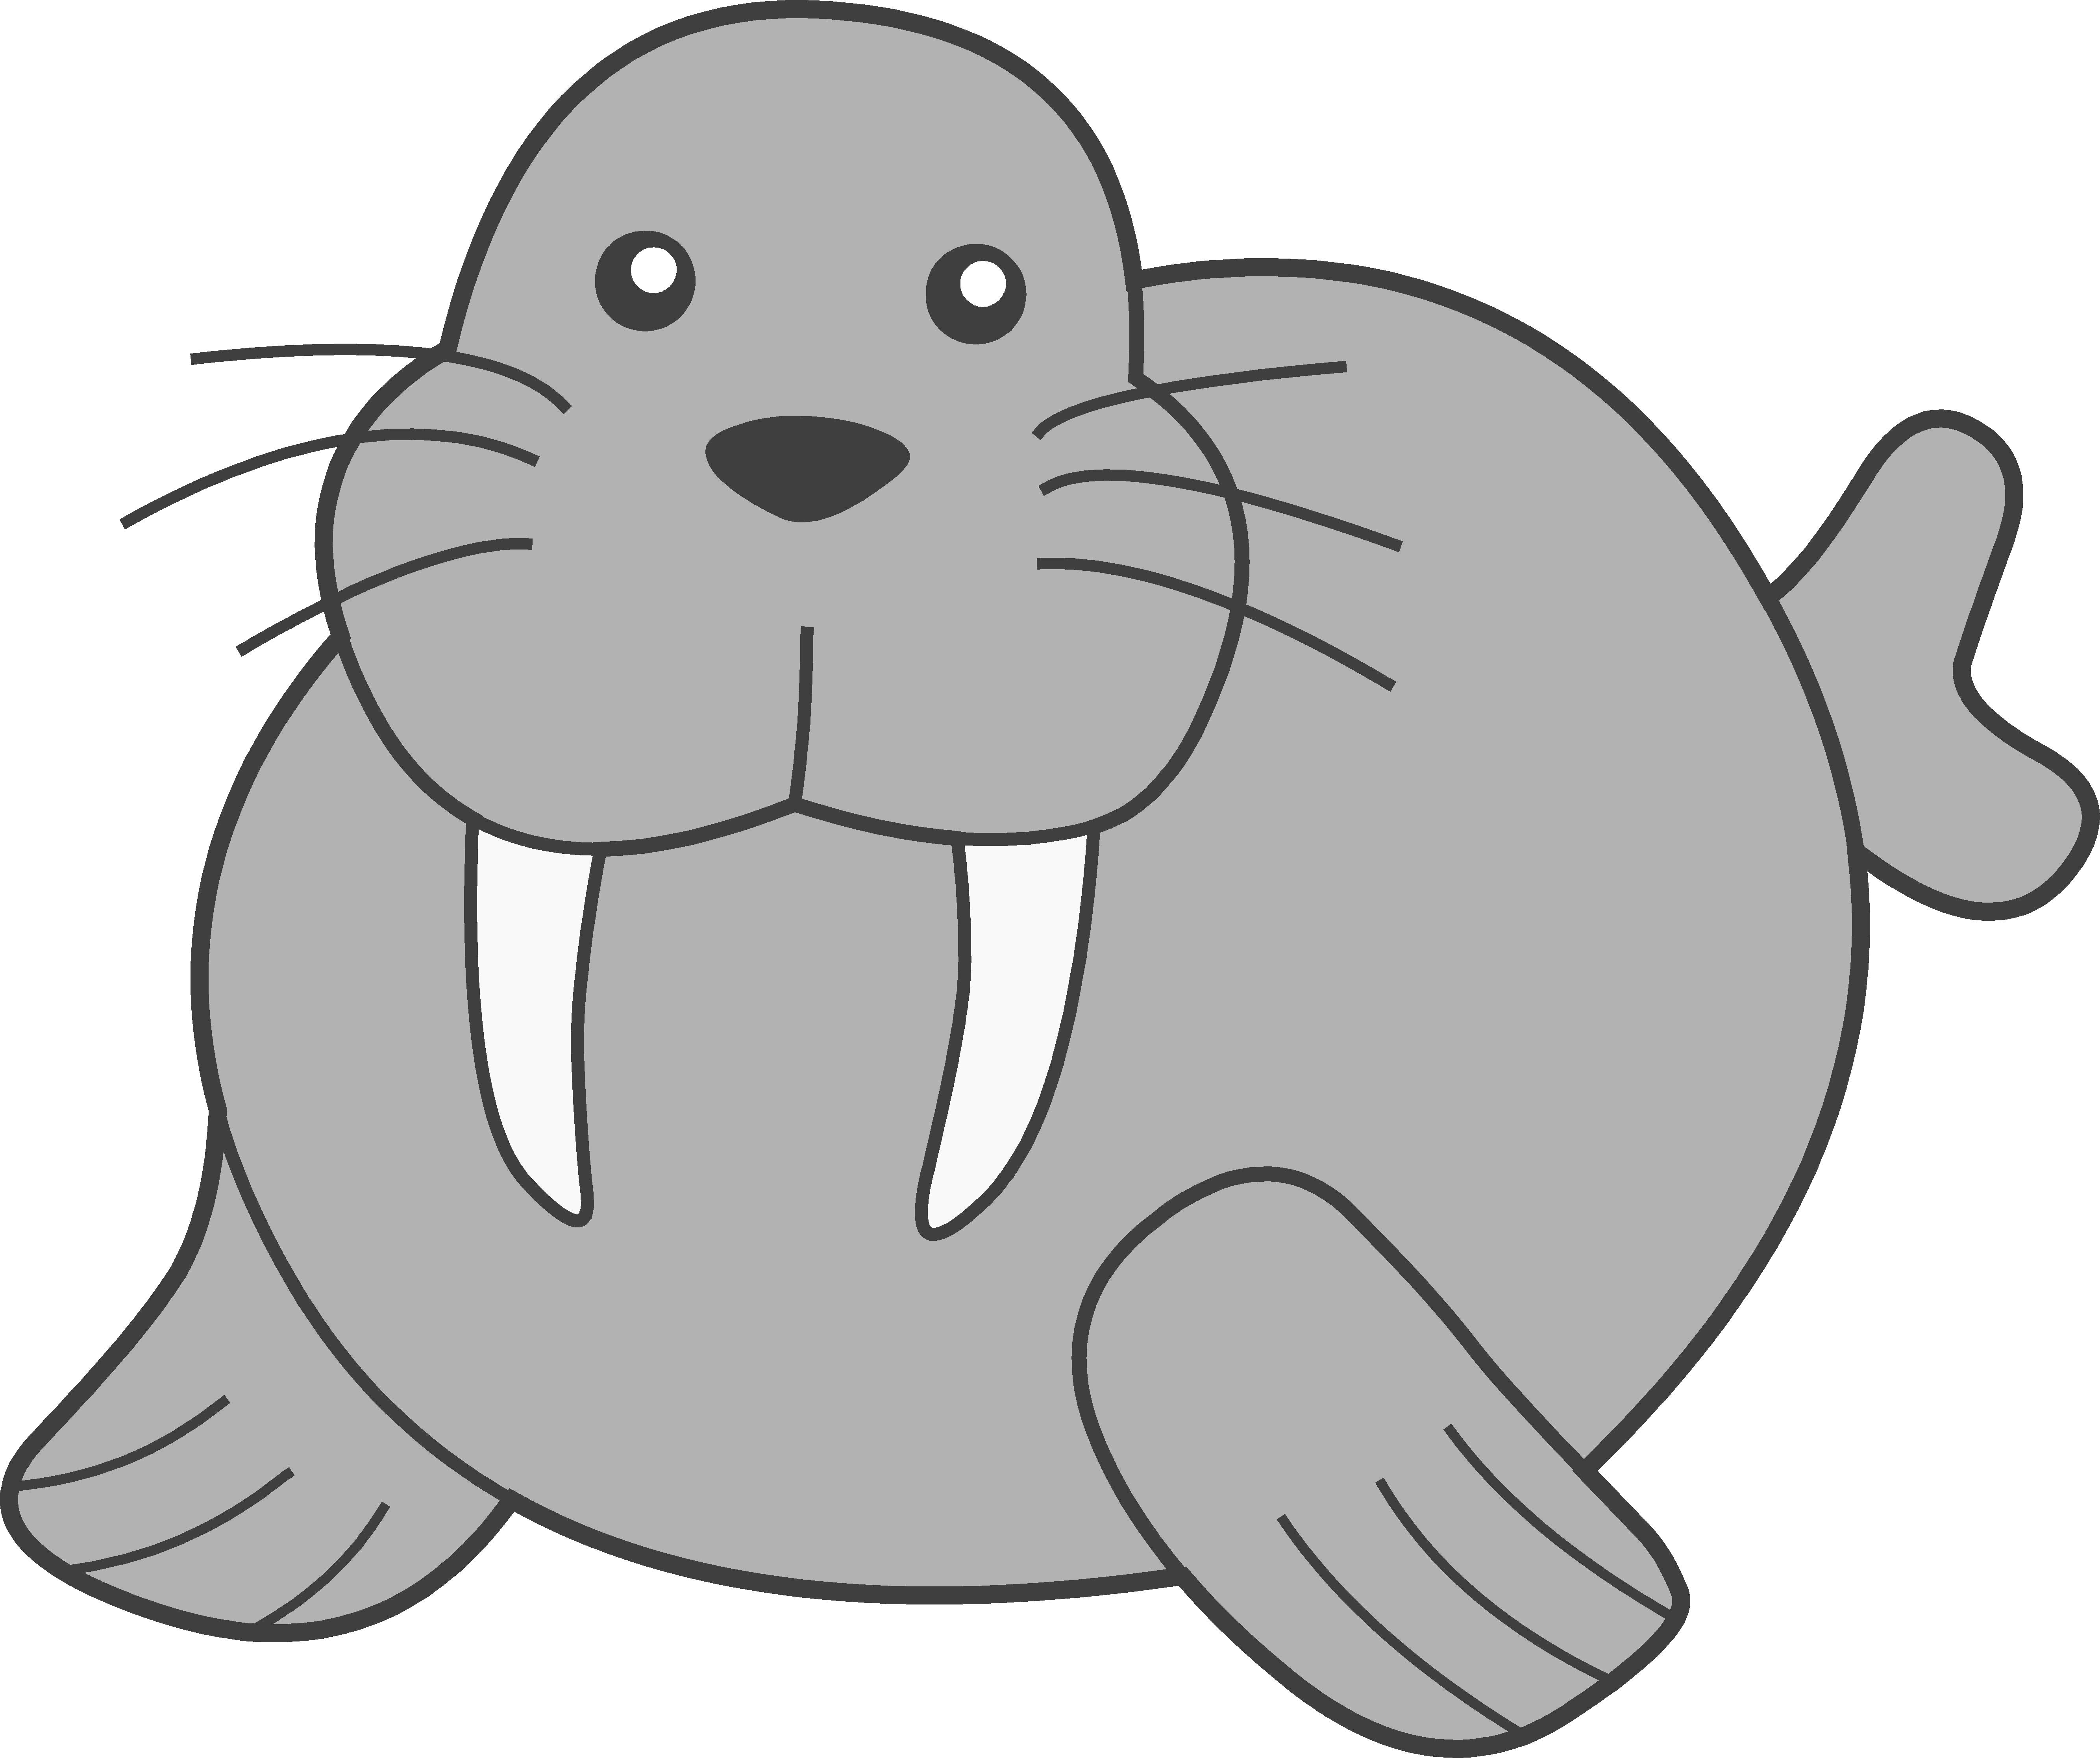 Clipart walrus vector library Walrus Clipart | Clipart Panda - Free Clipart Images vector library